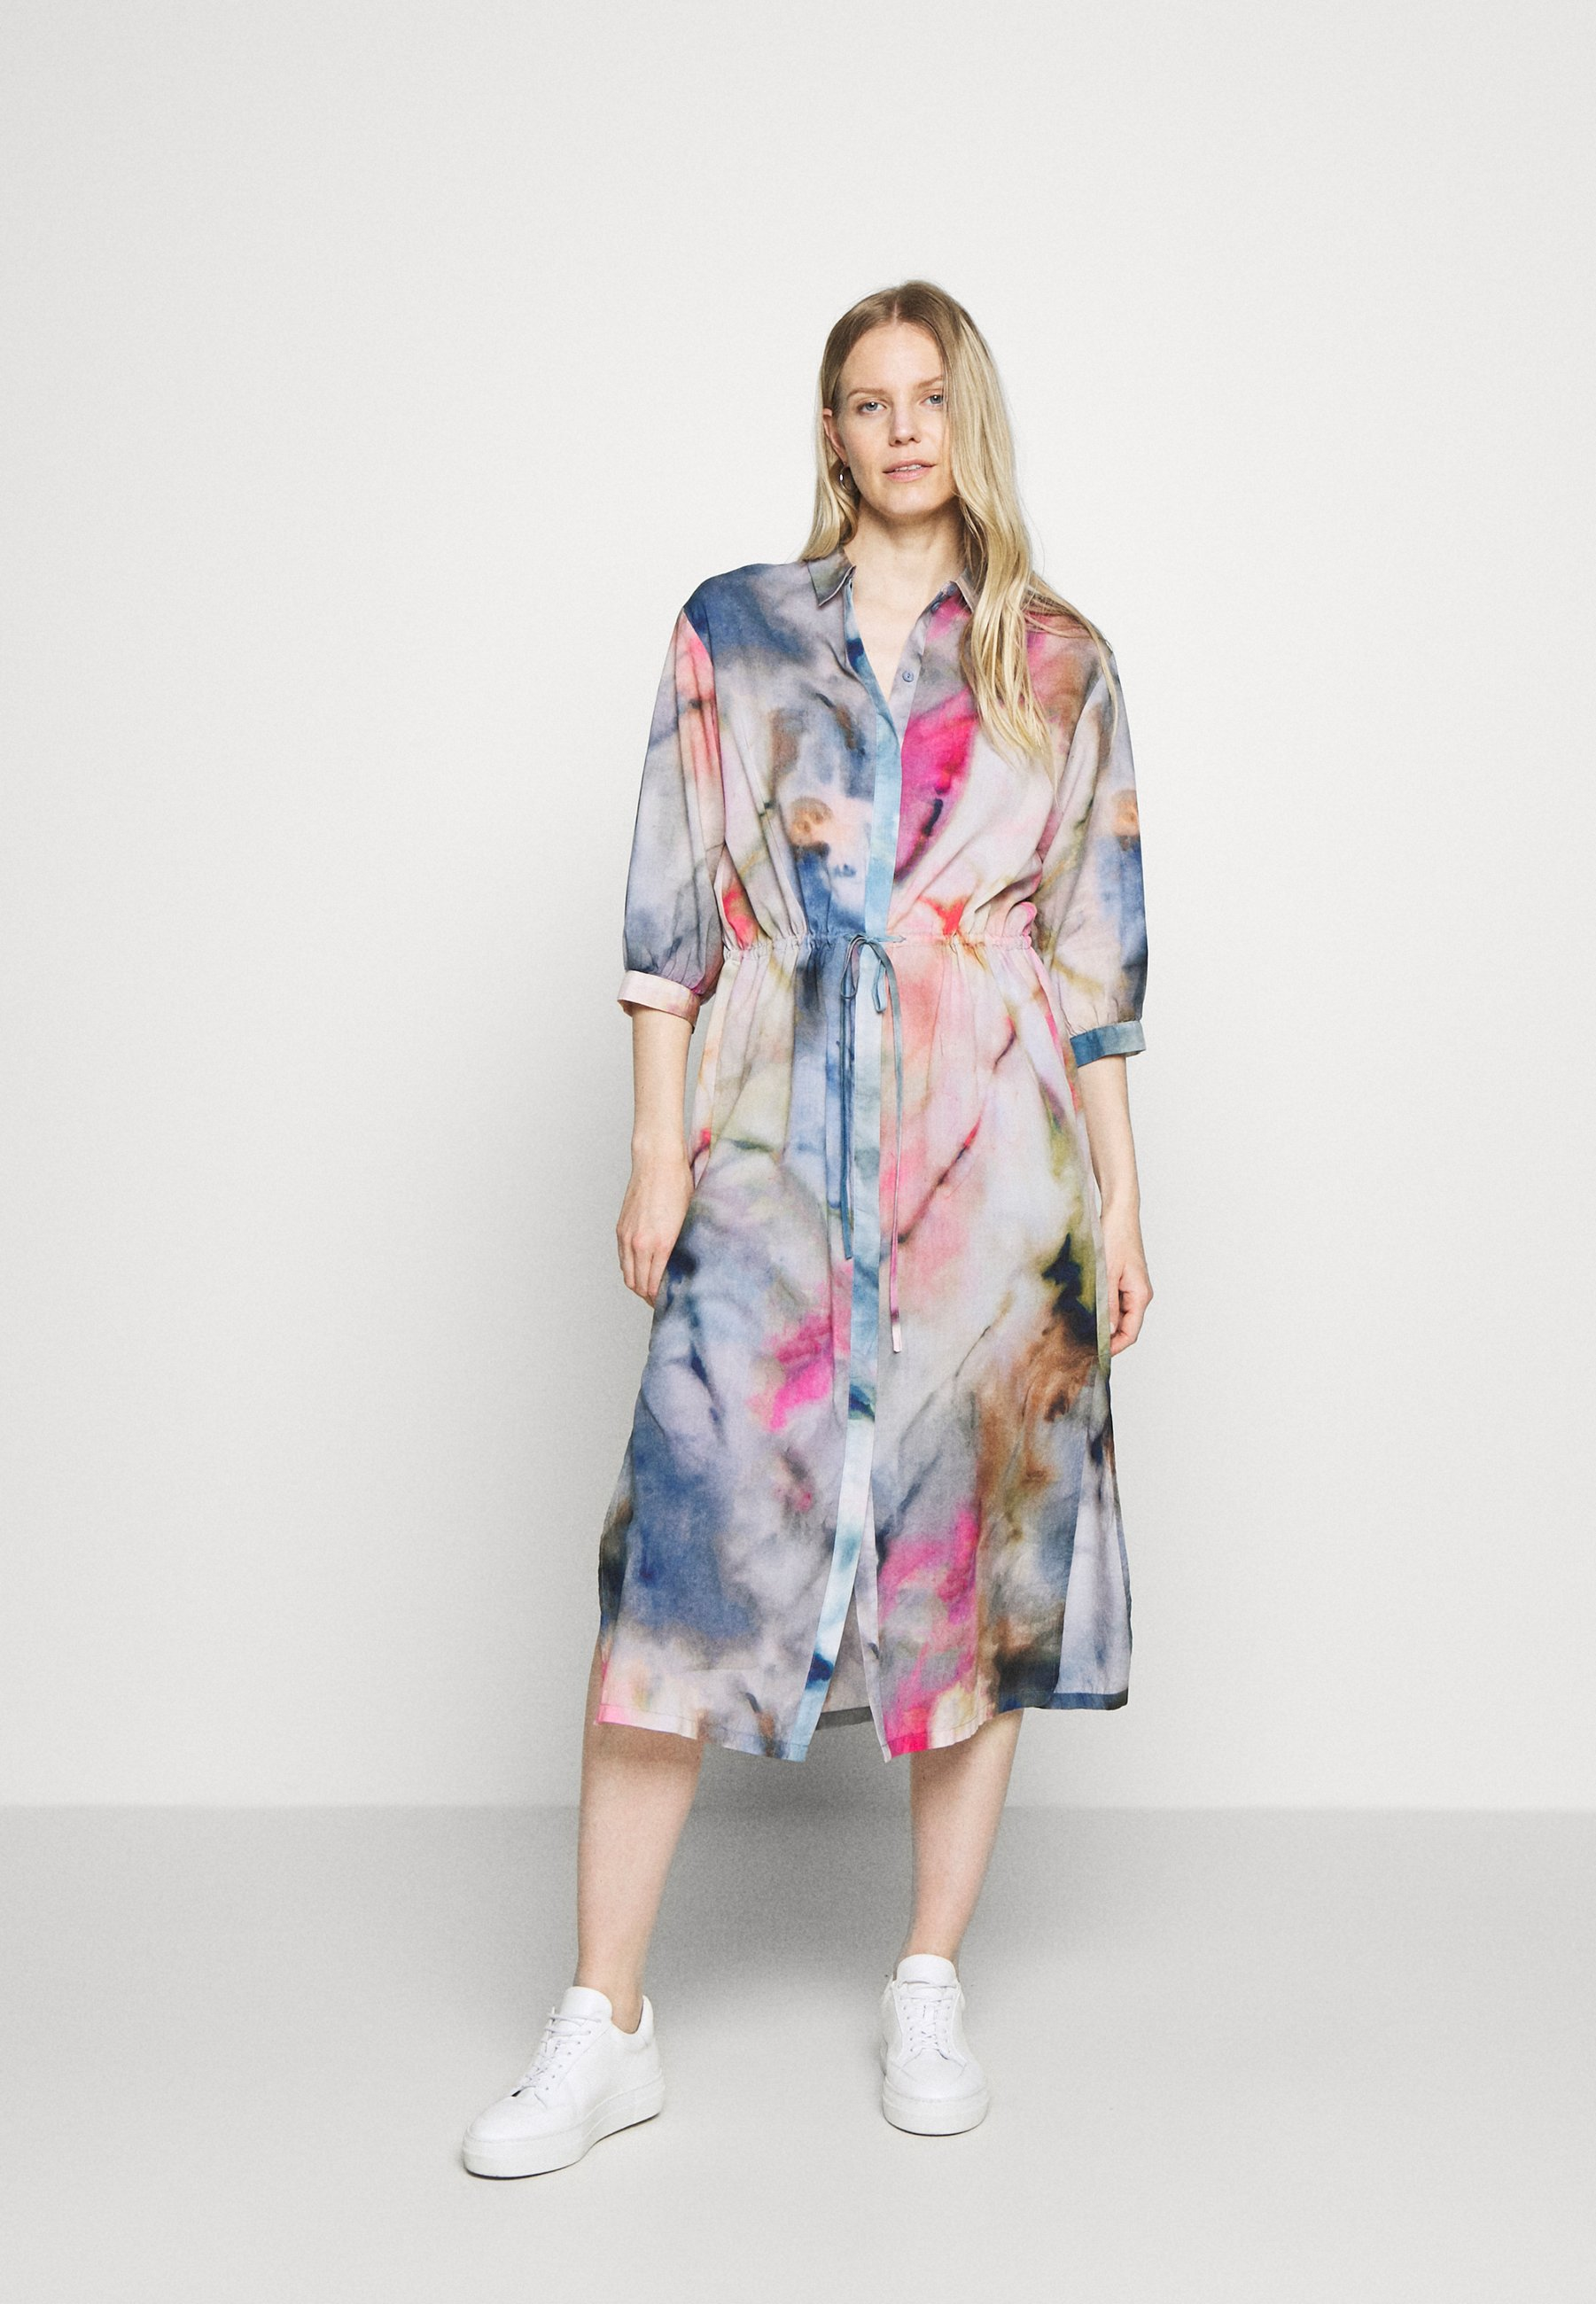 Outlet Store Women's Clothing Marc O'Polo DENIM Shirt dress multi/dream beach pm6mbmdw3